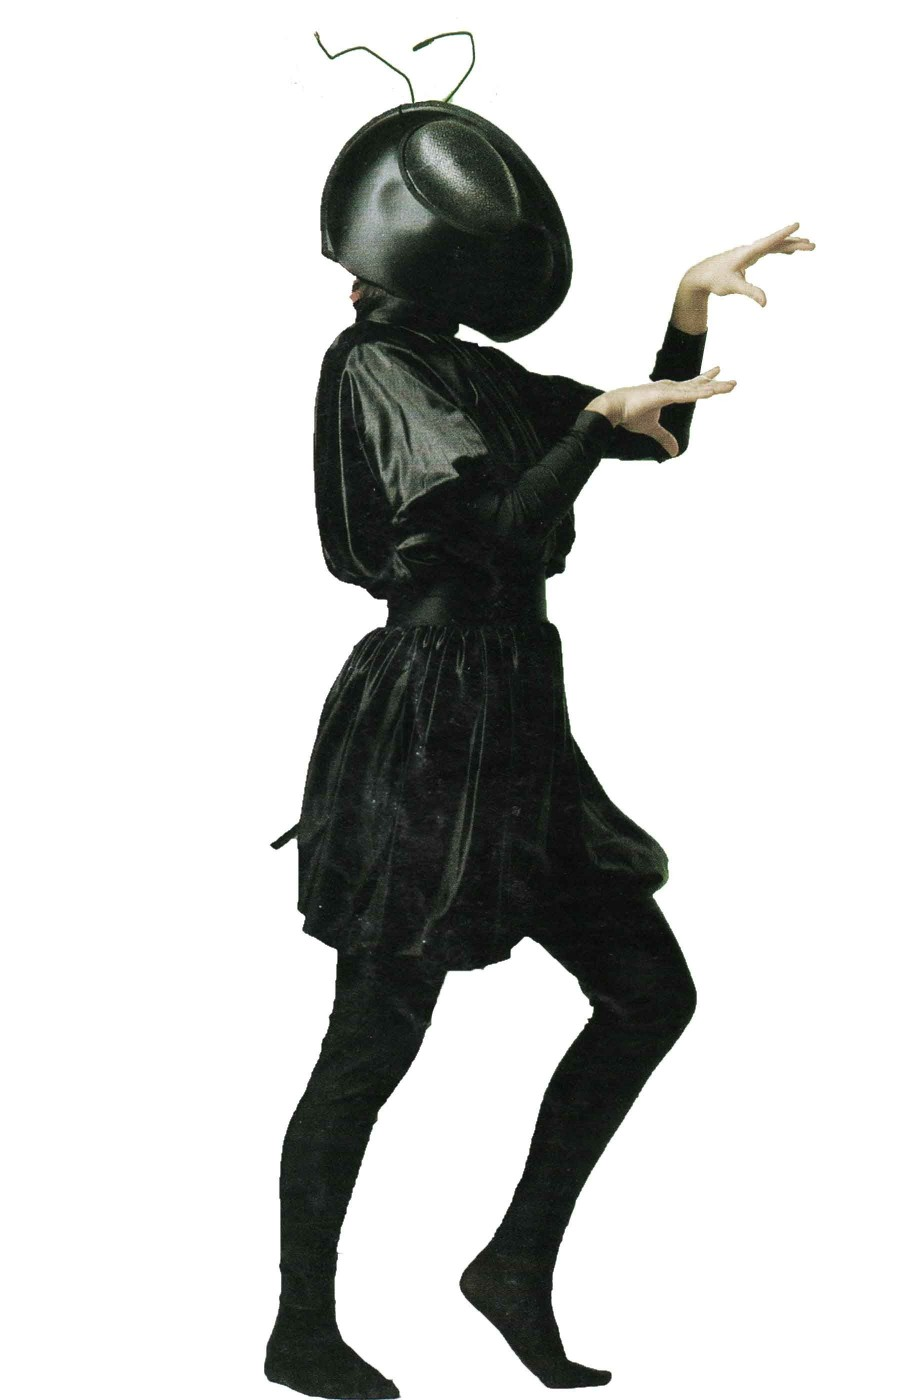 Costume halloween o di carnevale da formica per adulti uomo o donna